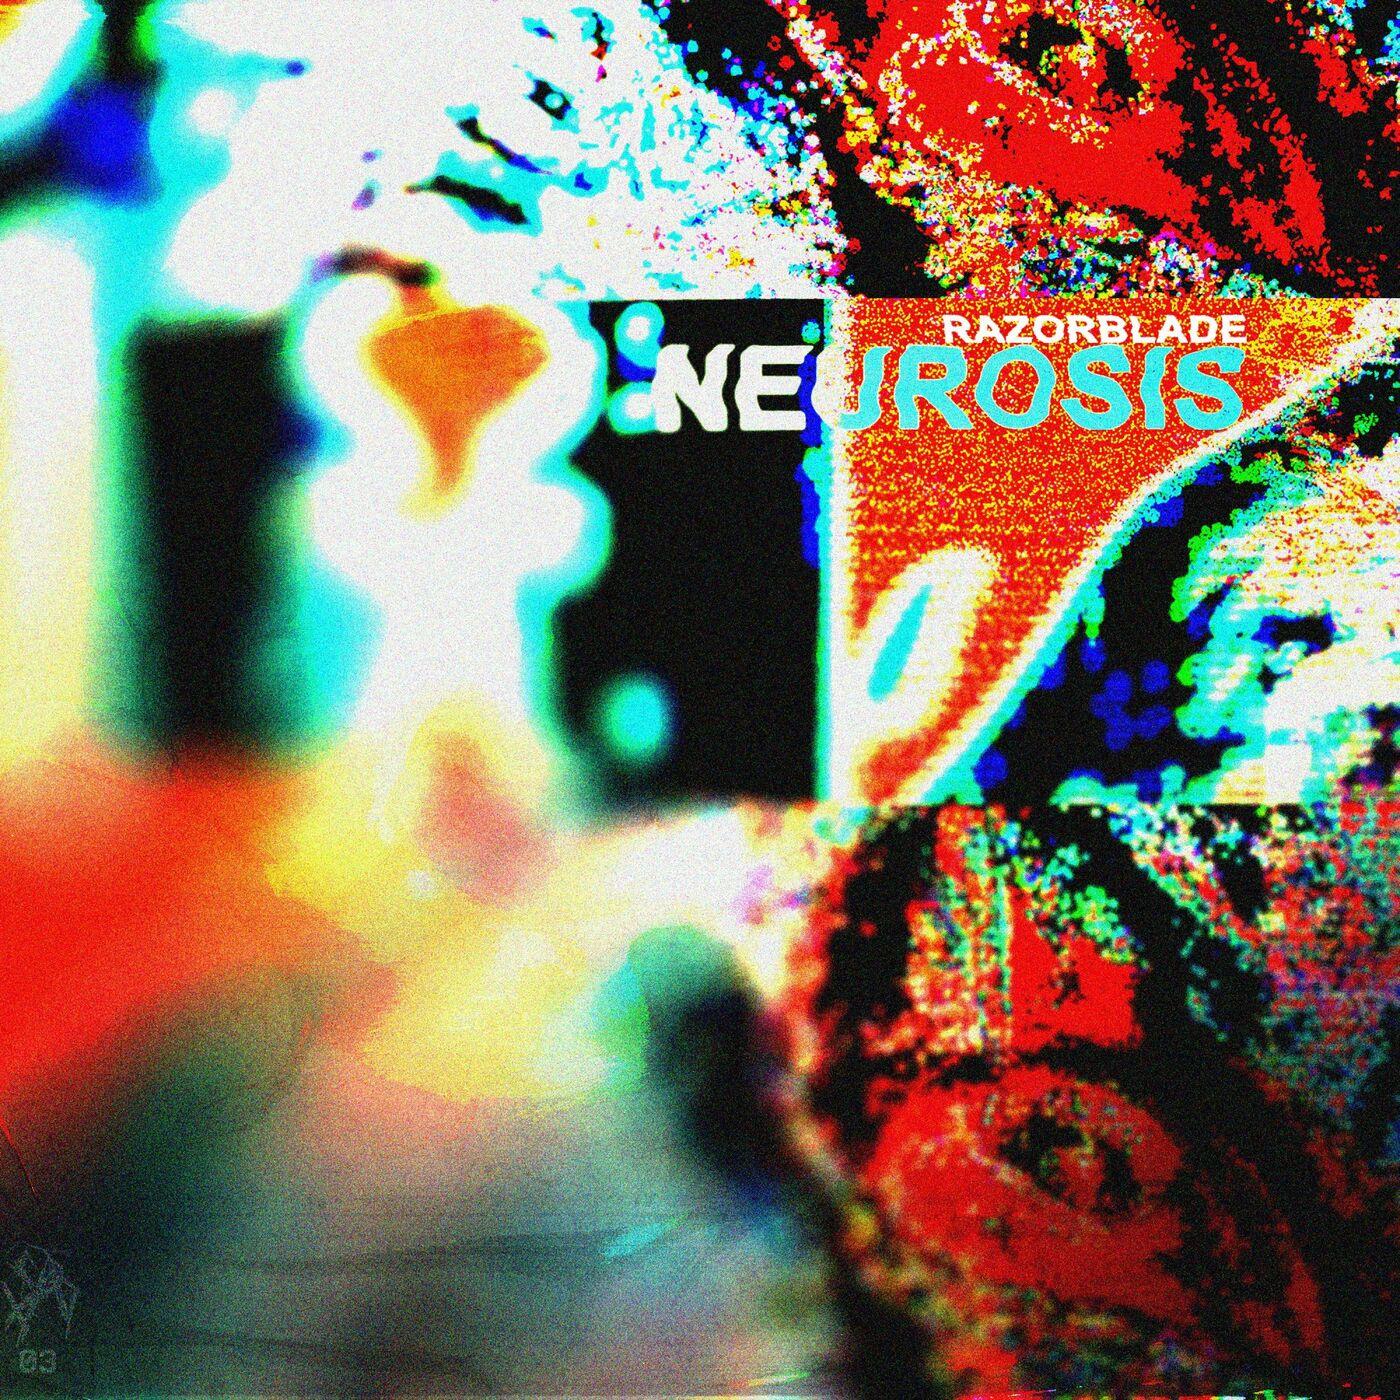 Still_bloom - Razorbladeneurosis [single] (2020)